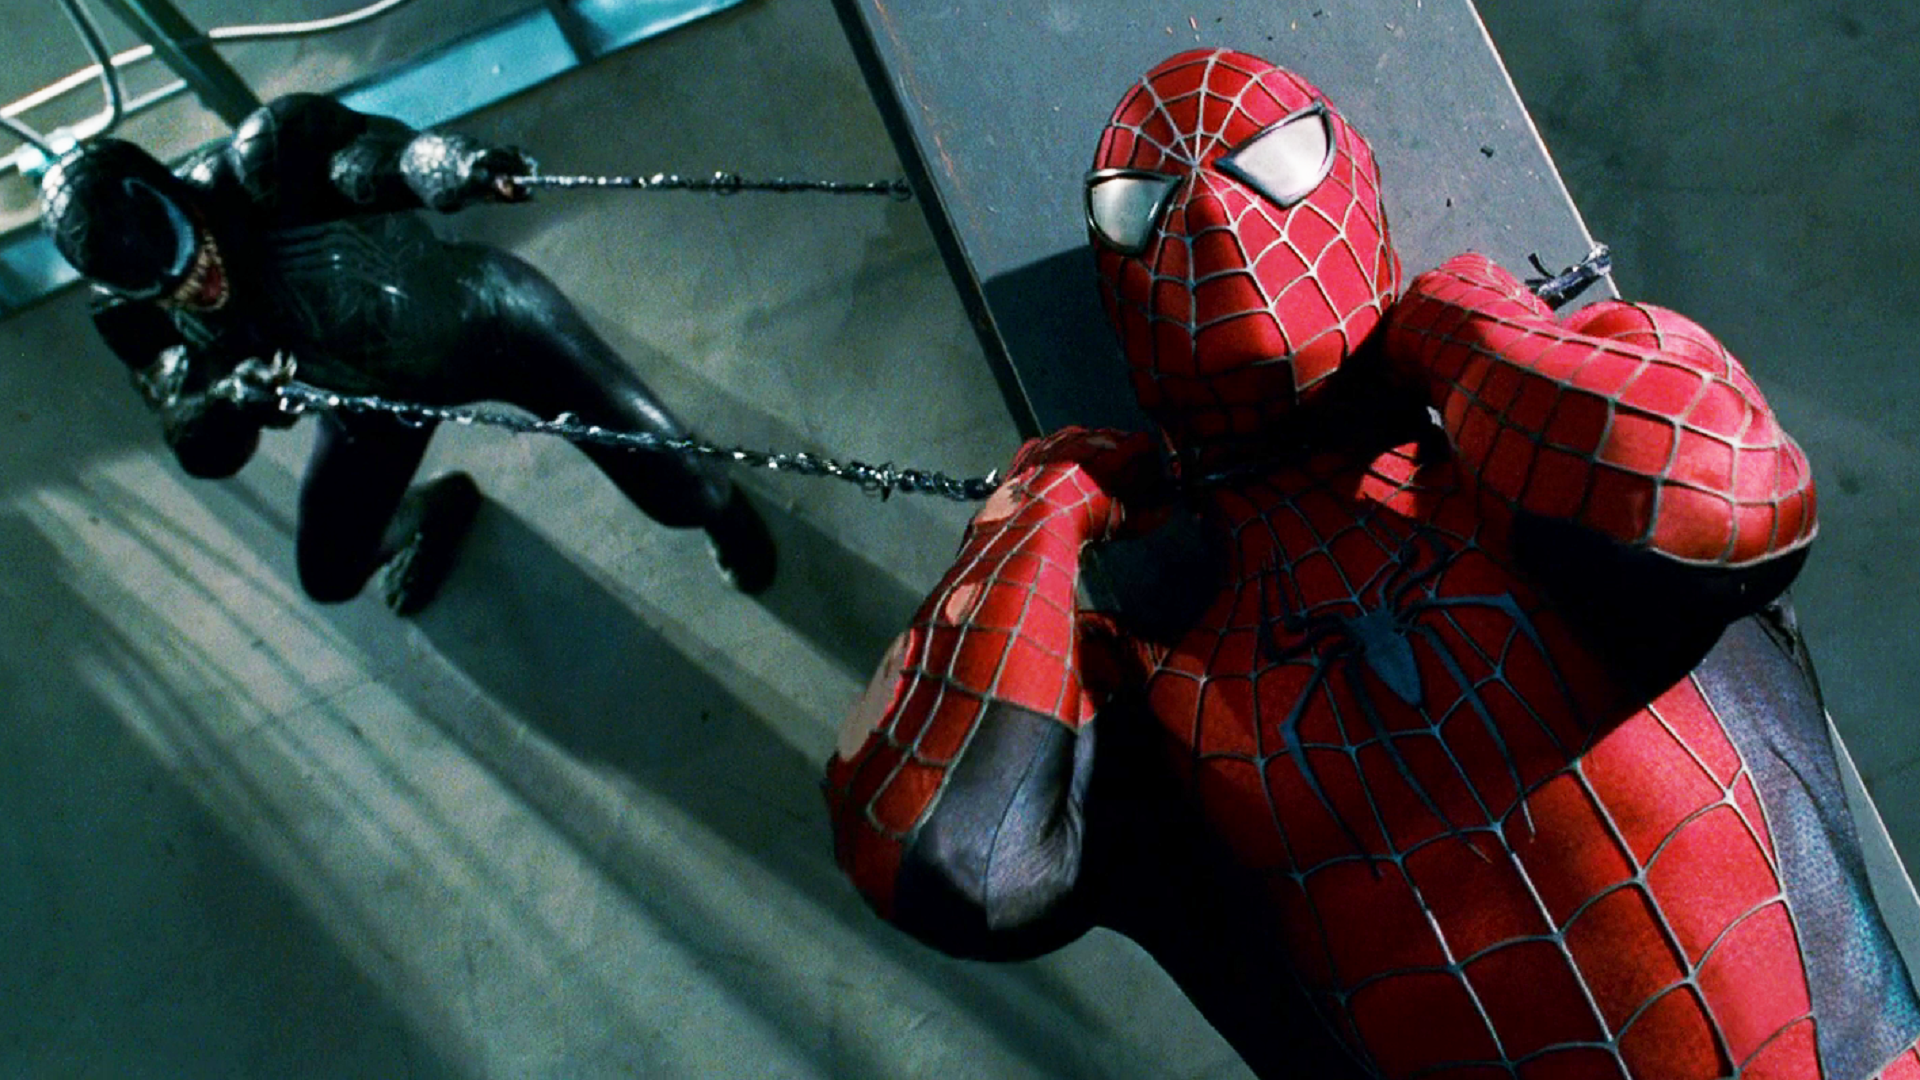 Spider Man Vs Venom Hd Wallpaper Background Image 1920x1080